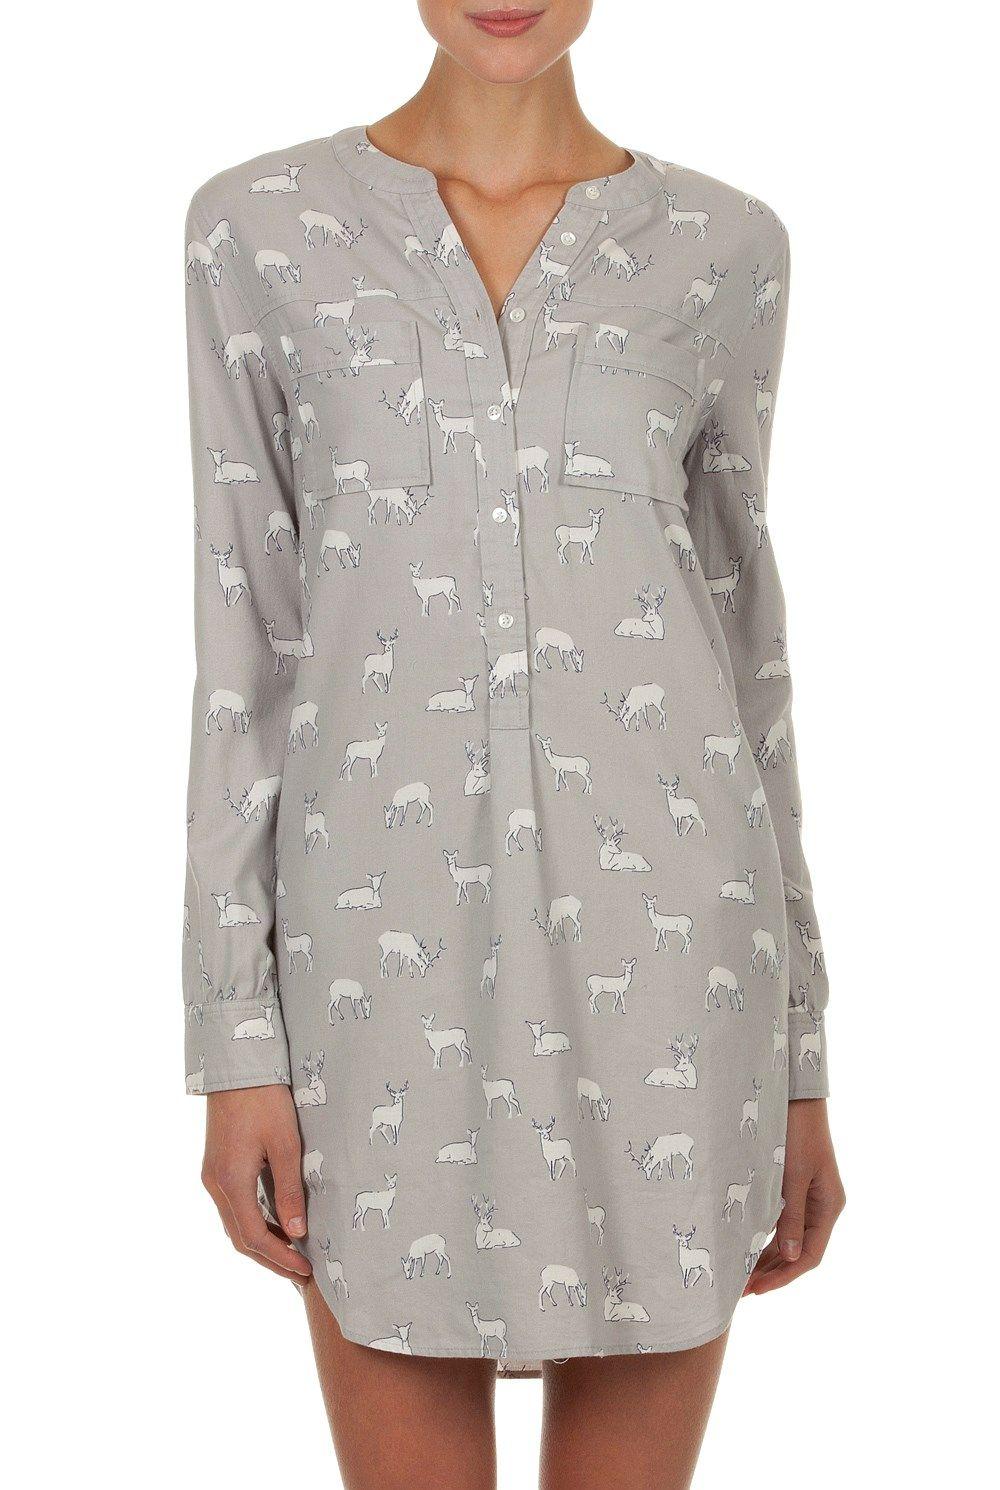 Pijama | patrones de costura | Pinterest